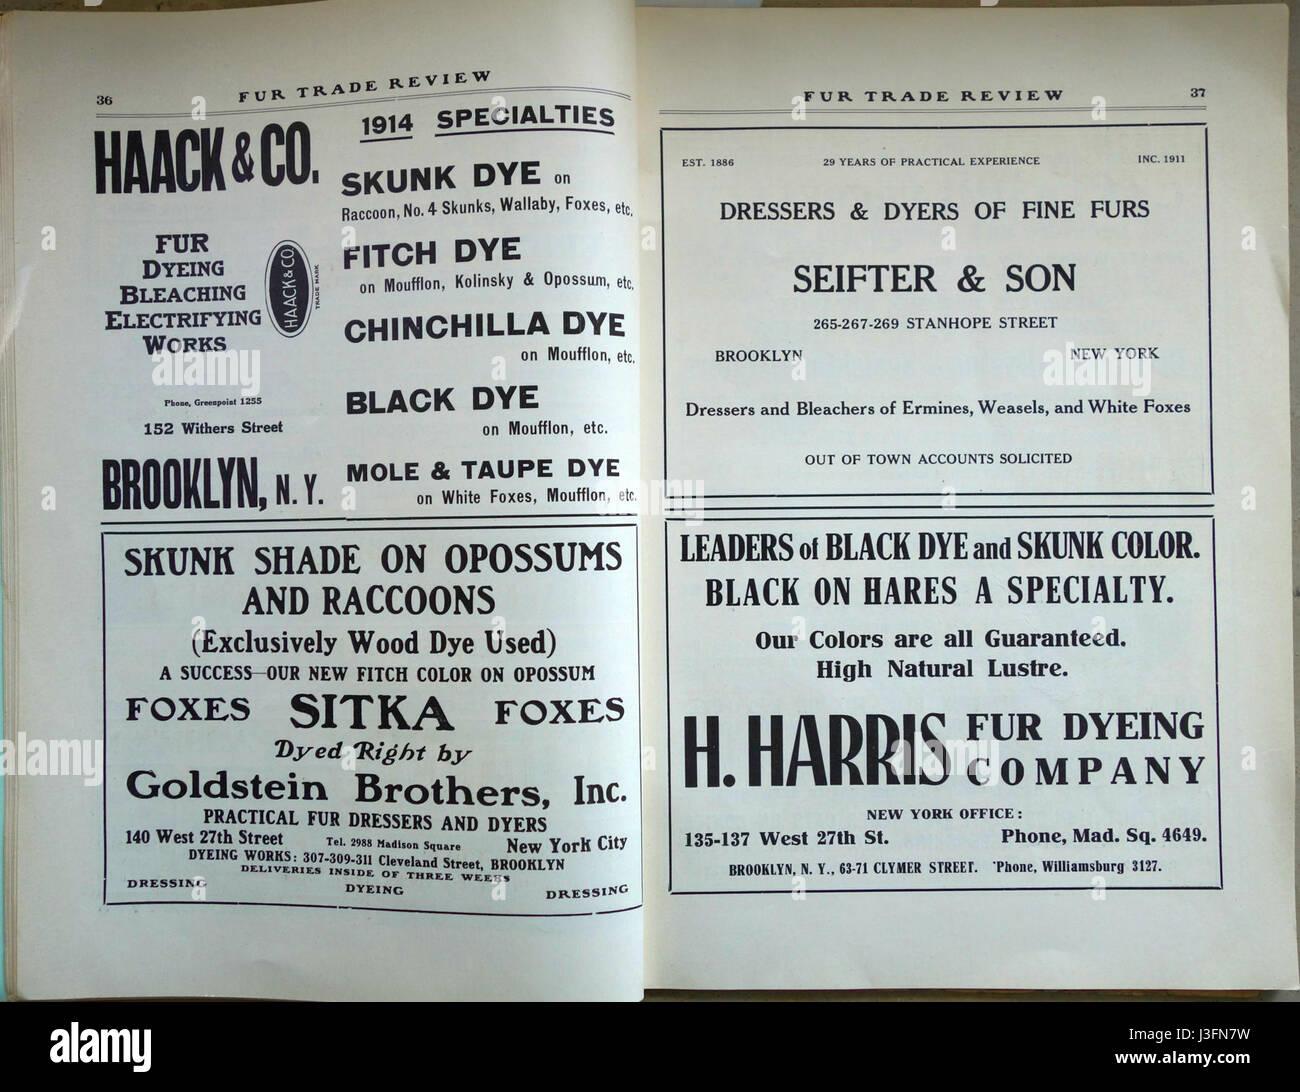 Fur Trade Review November 1914 (19) - Stock Image